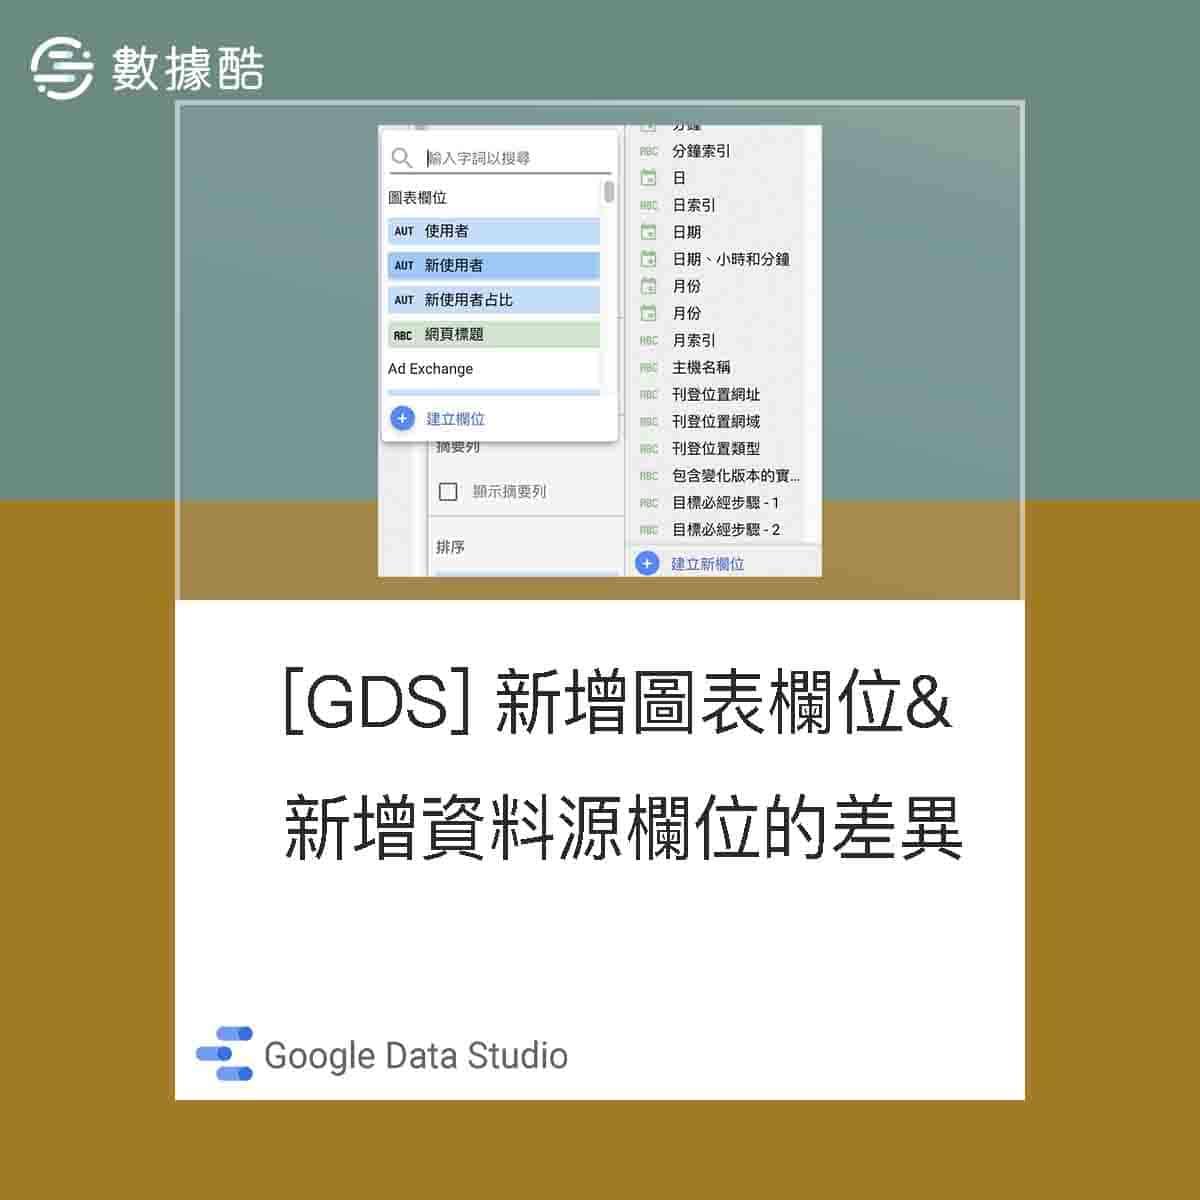 Data Studio 新增資料源欄位